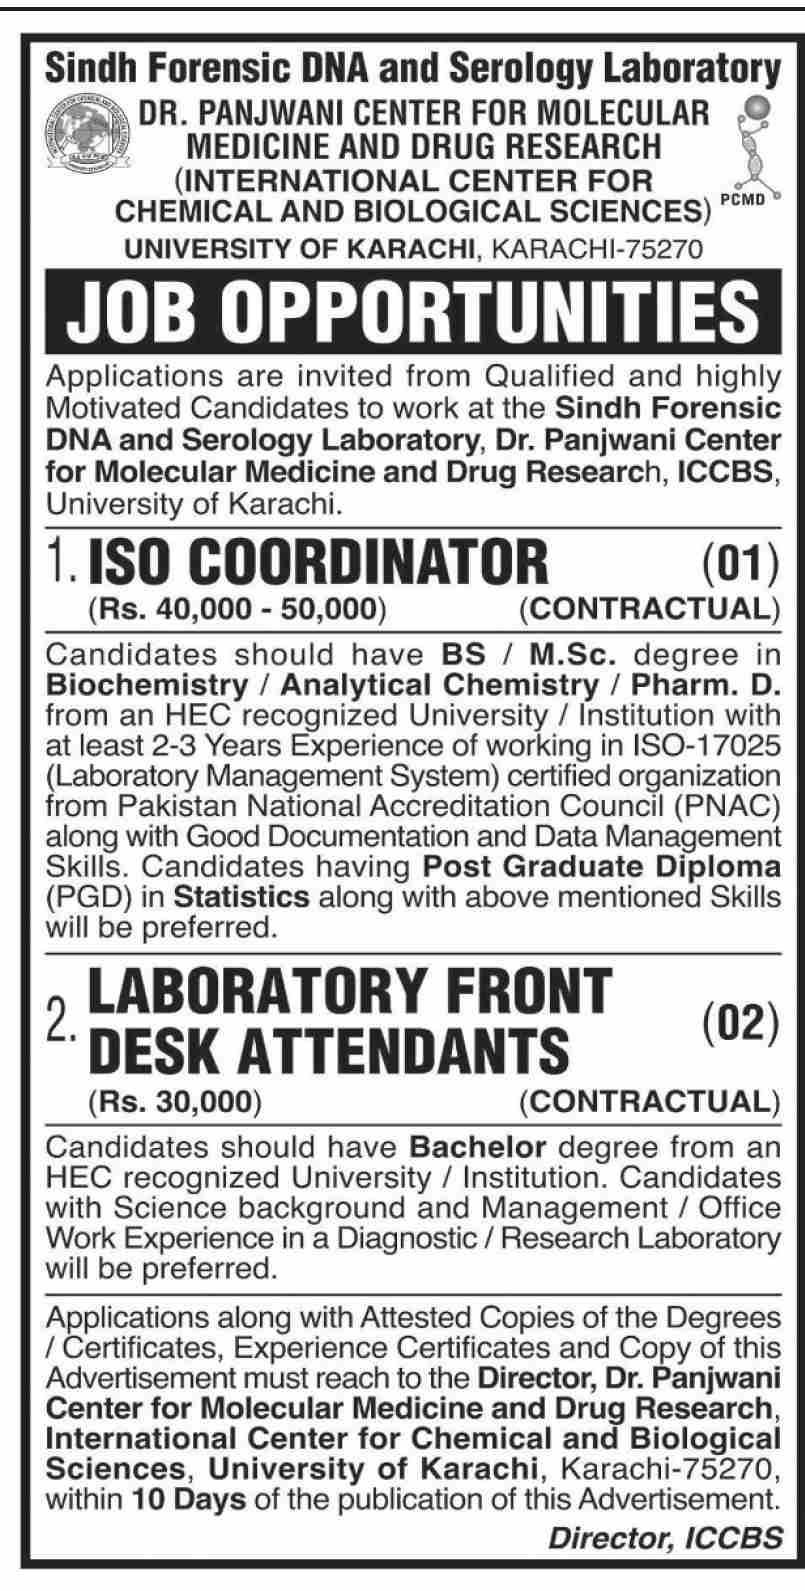 Sindh Forensic DNA and Serology Laboratory (University of Karachi) Jobs 2021 in Pakistan